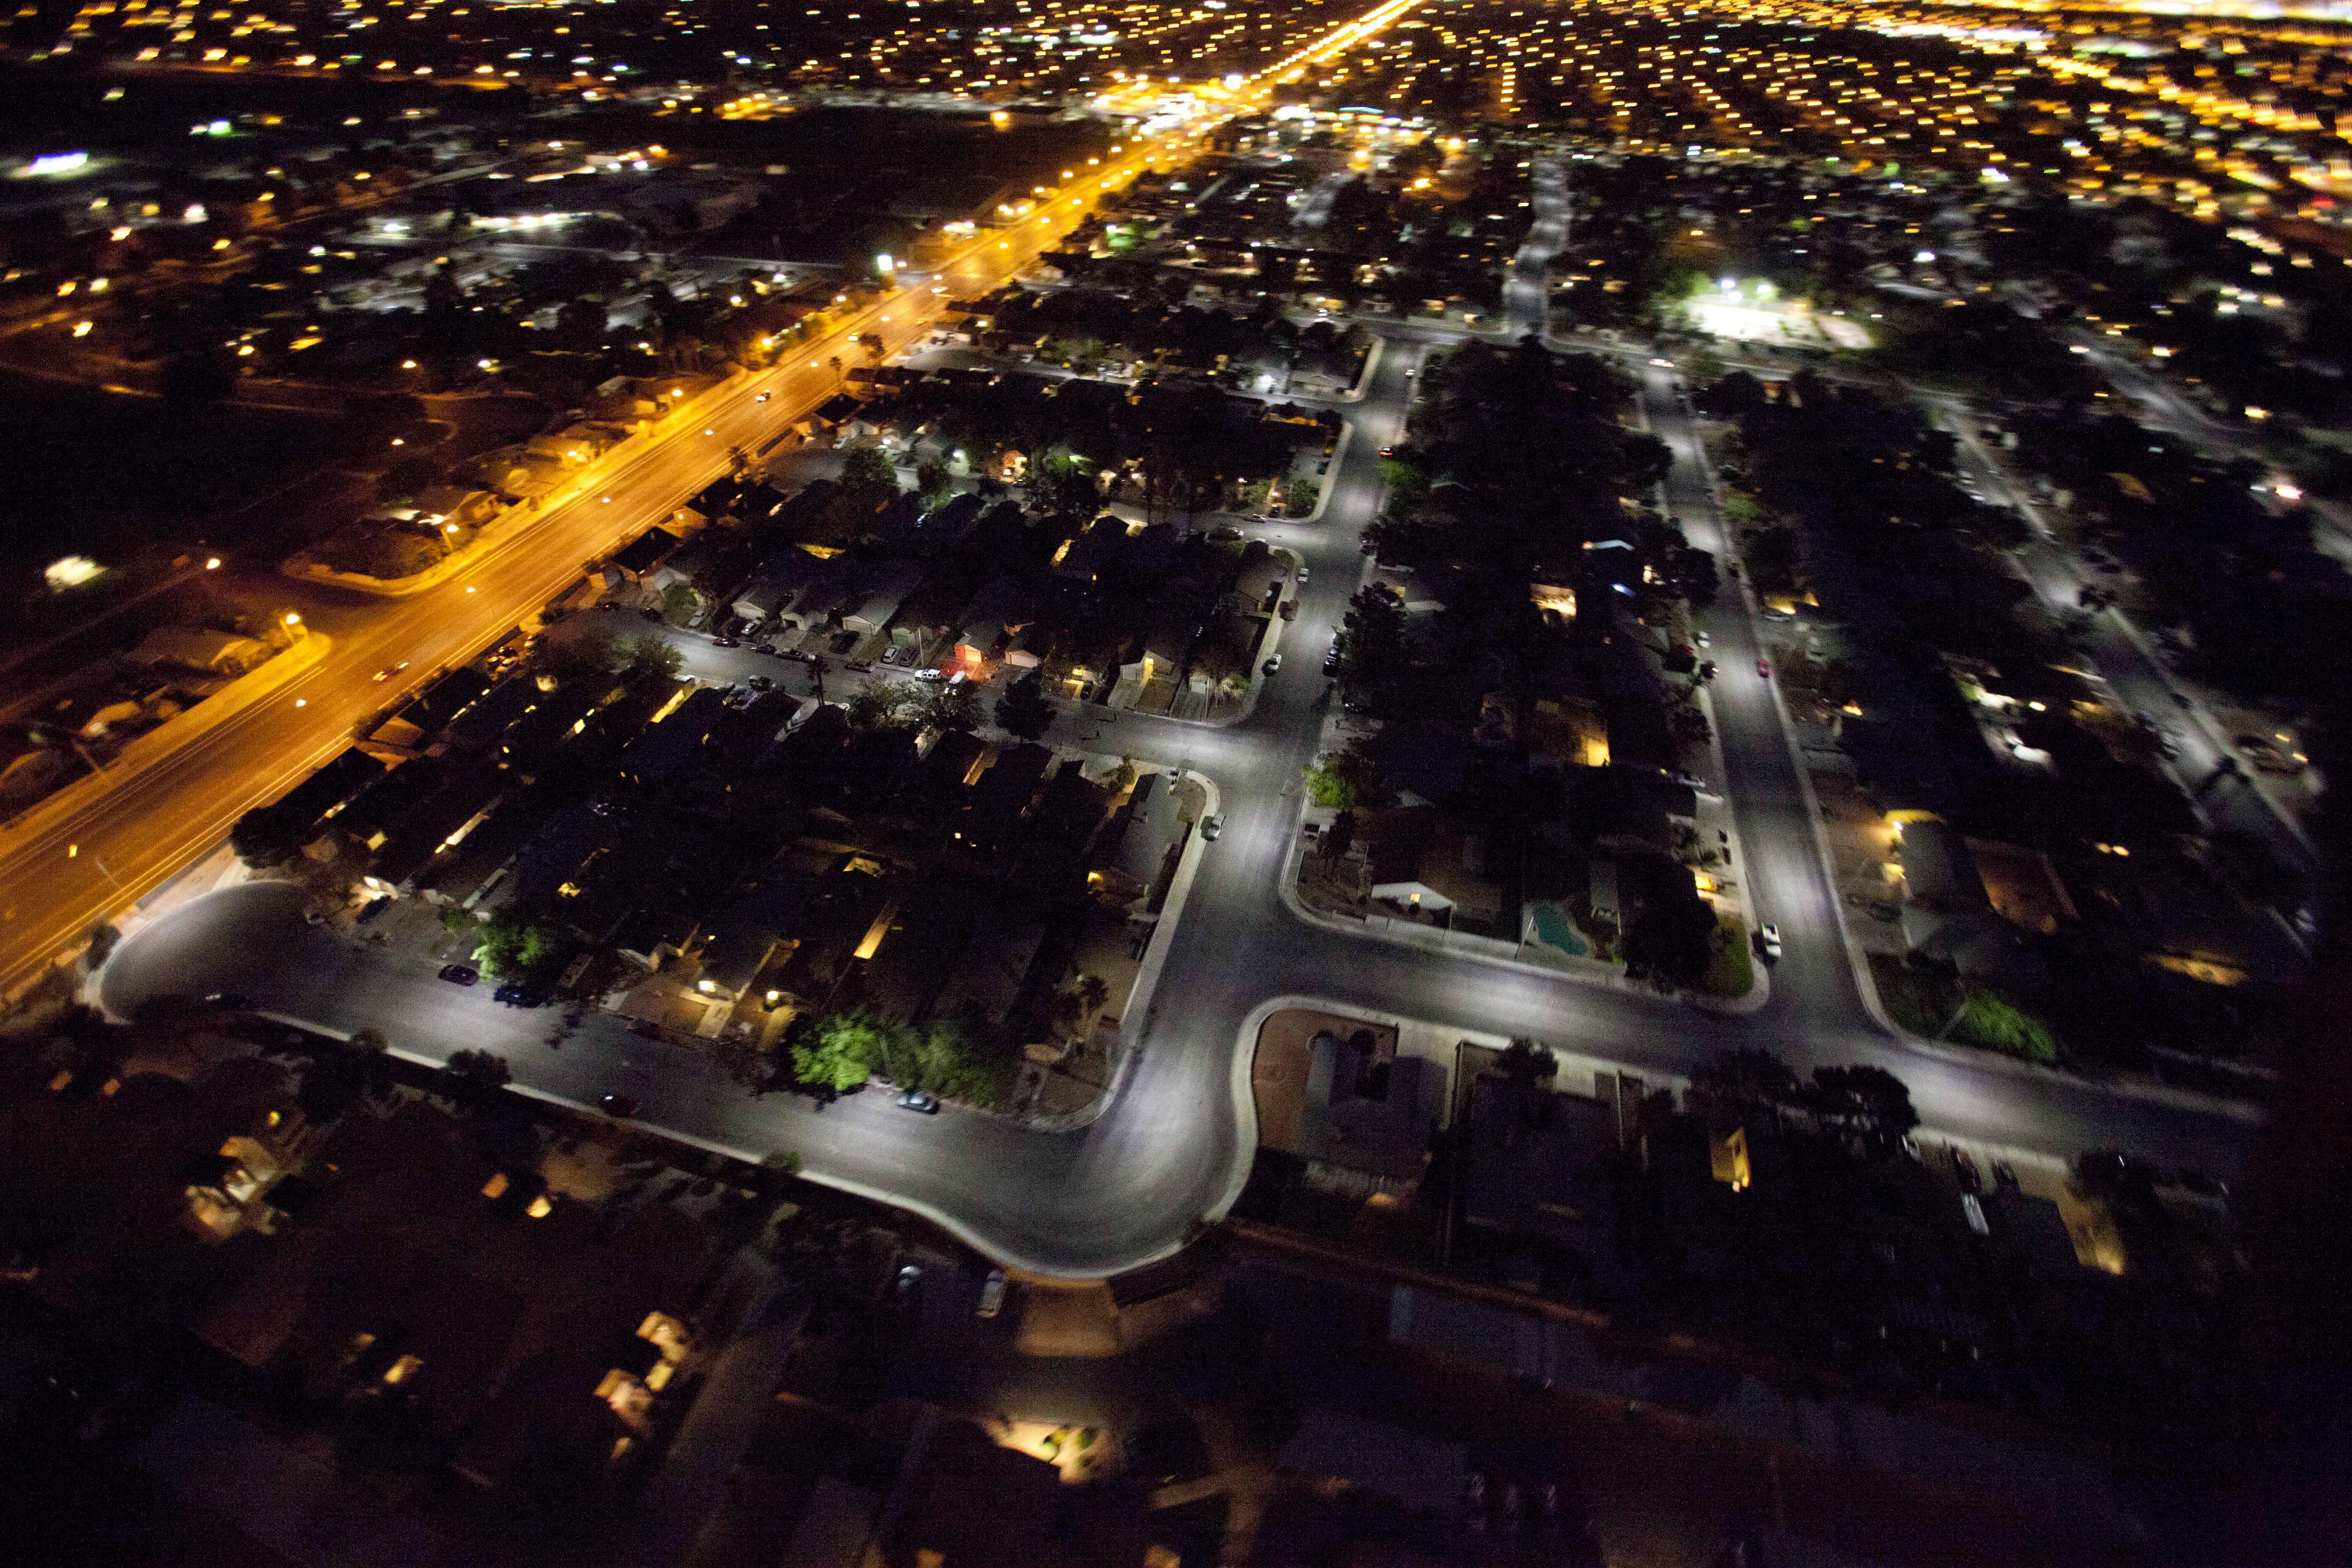 Energy-Efficient GE LED Street Lighting Works Wonders for ...